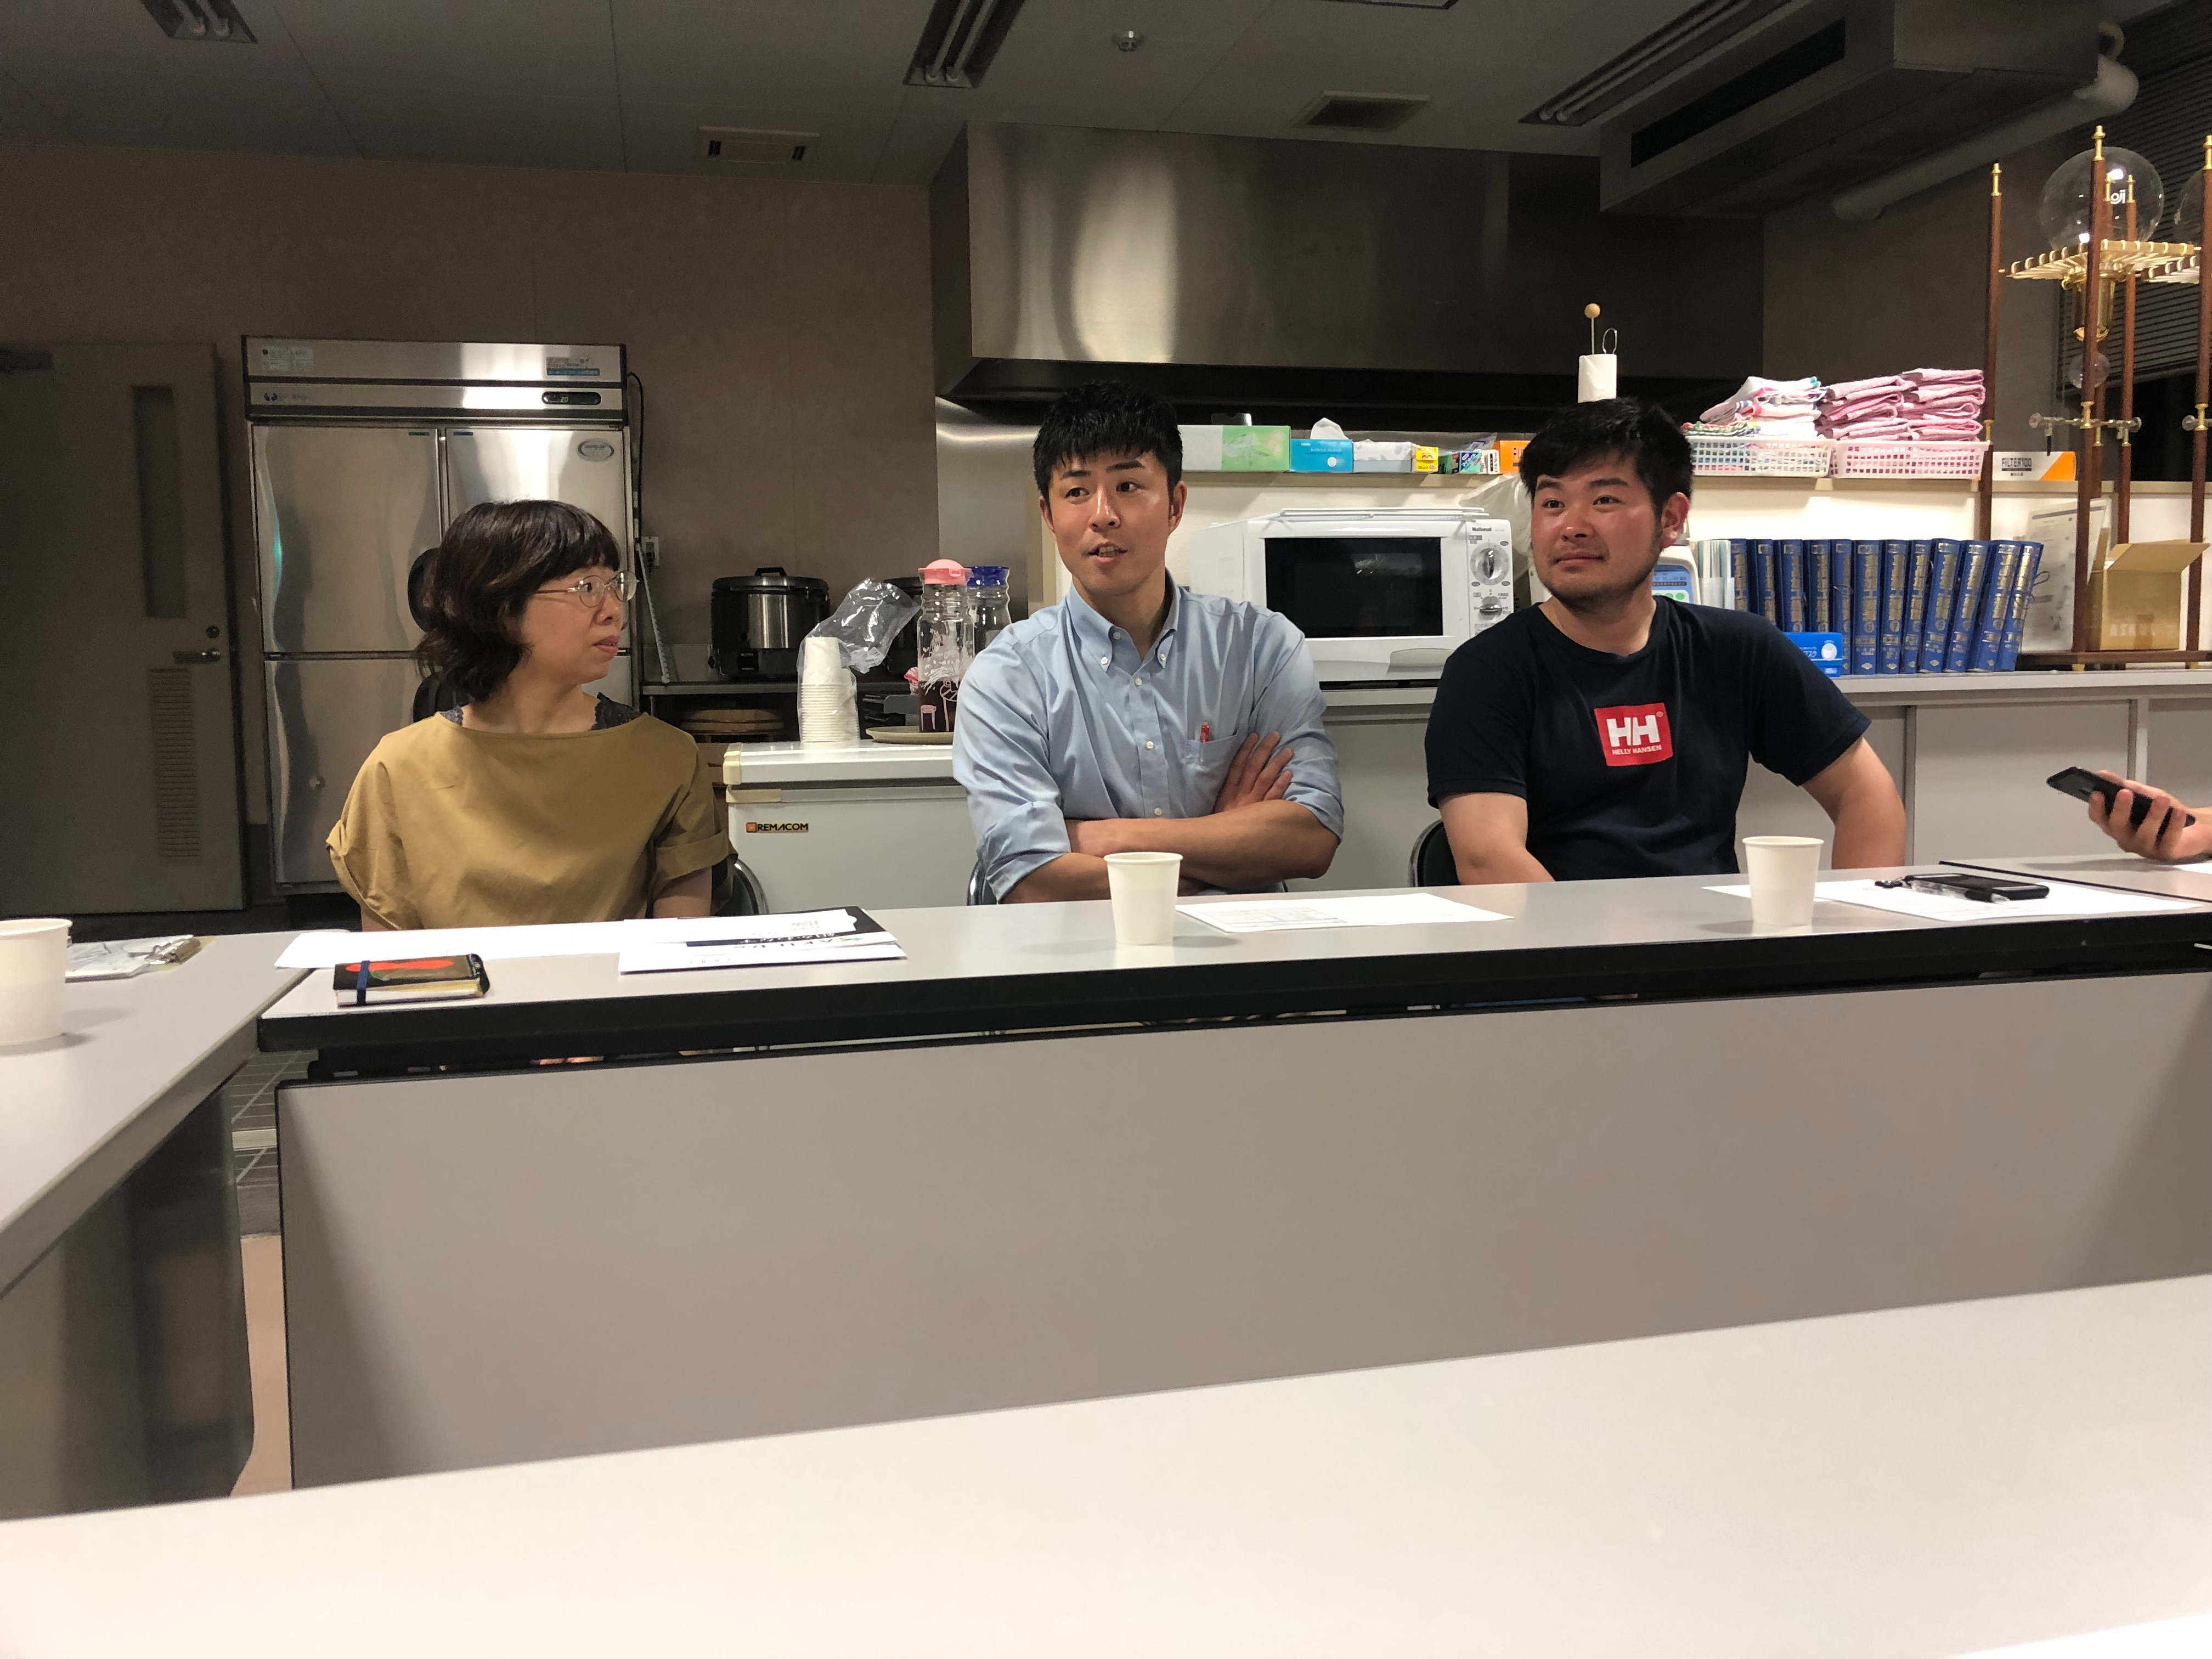 f:id:masanori-kato1972:20190618202543j:image